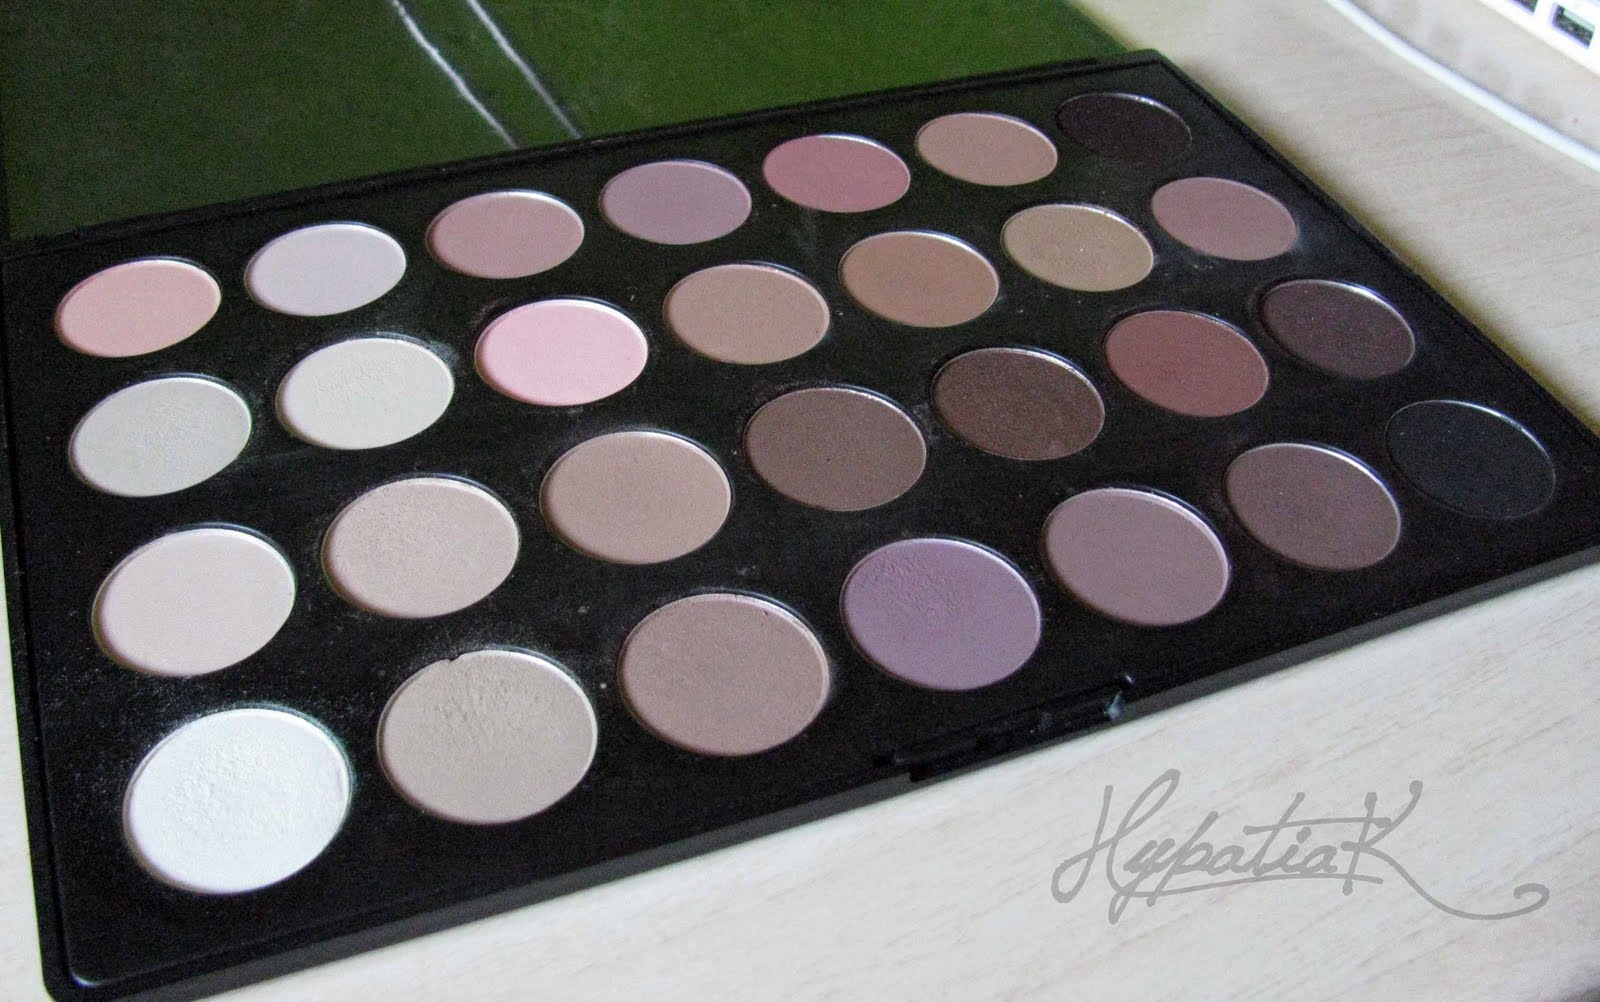 Hypatiak paleta 28 colores neutros - Paleta de colores neutros ...